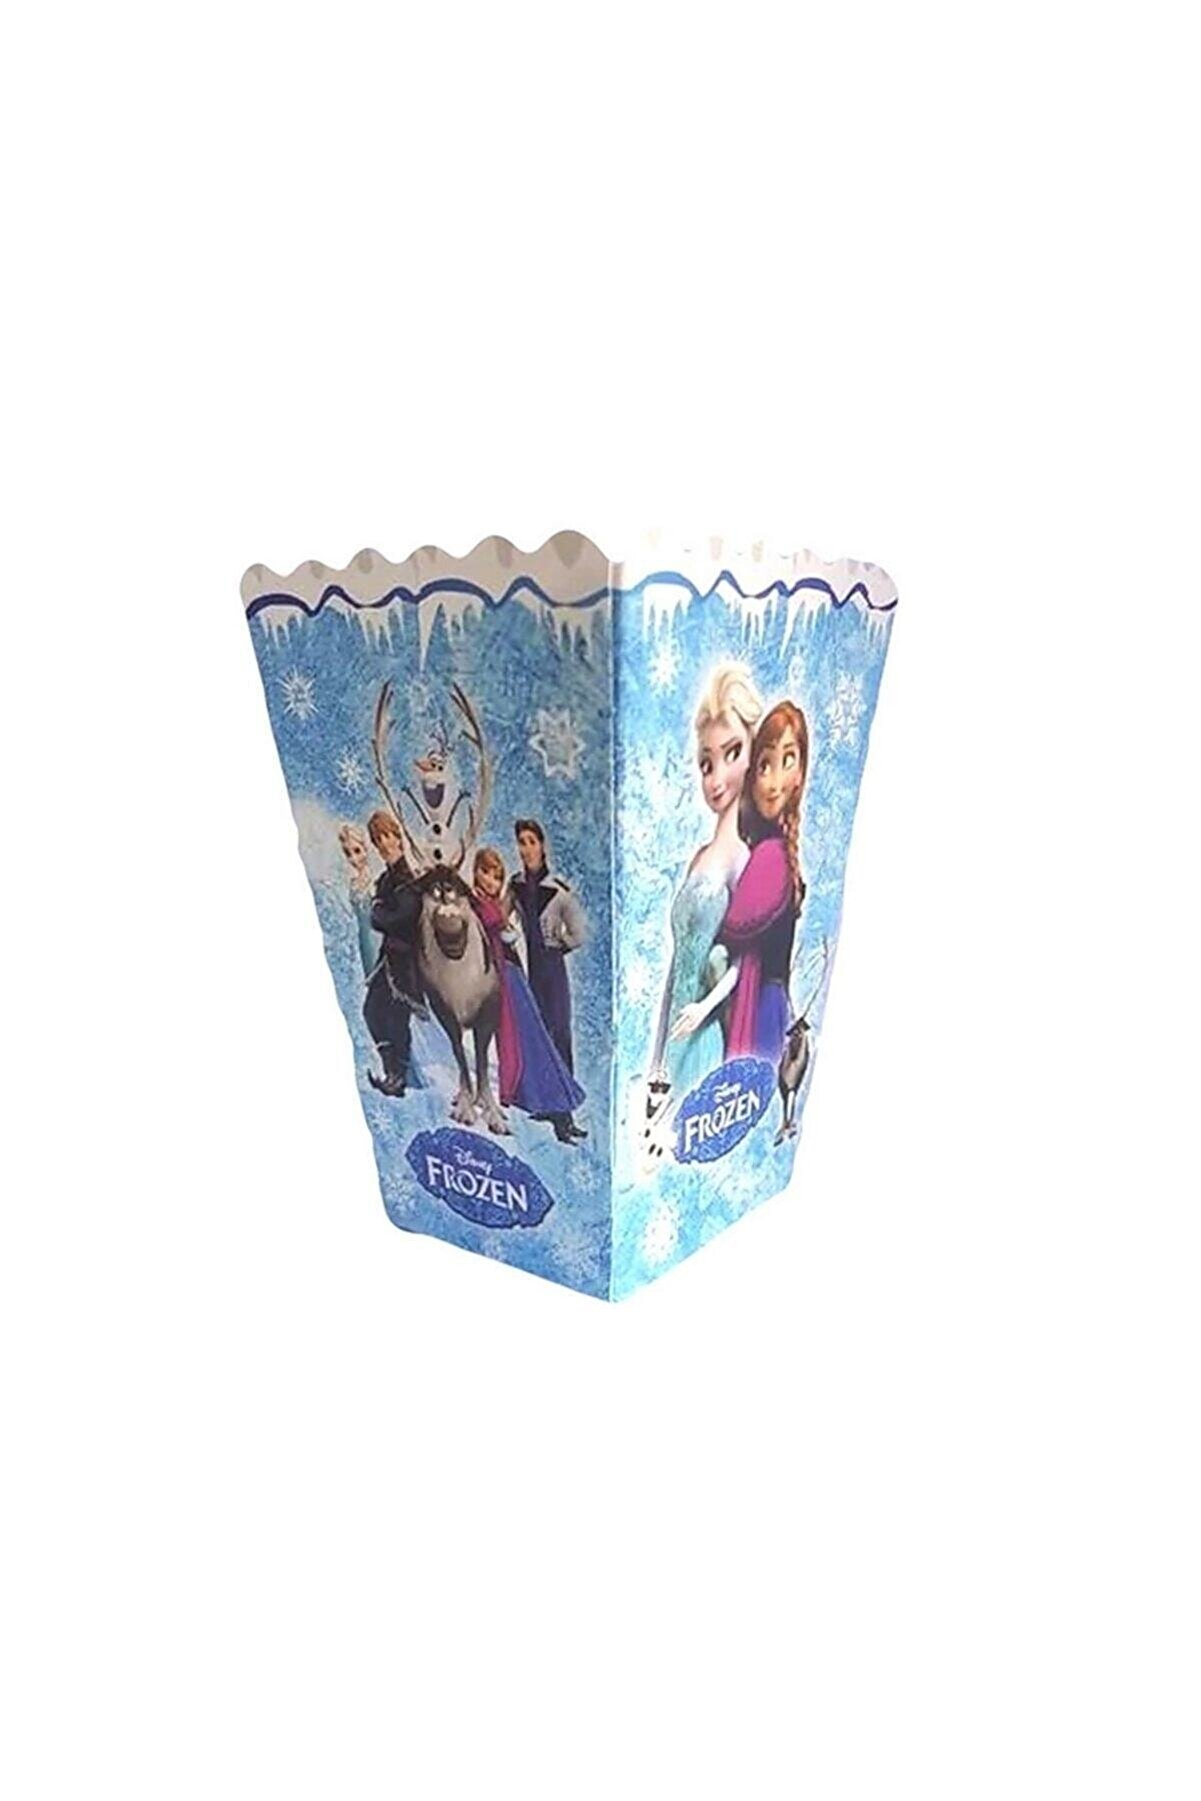 Frozen Elsa Frozen, Elsa Mısır Kutusu